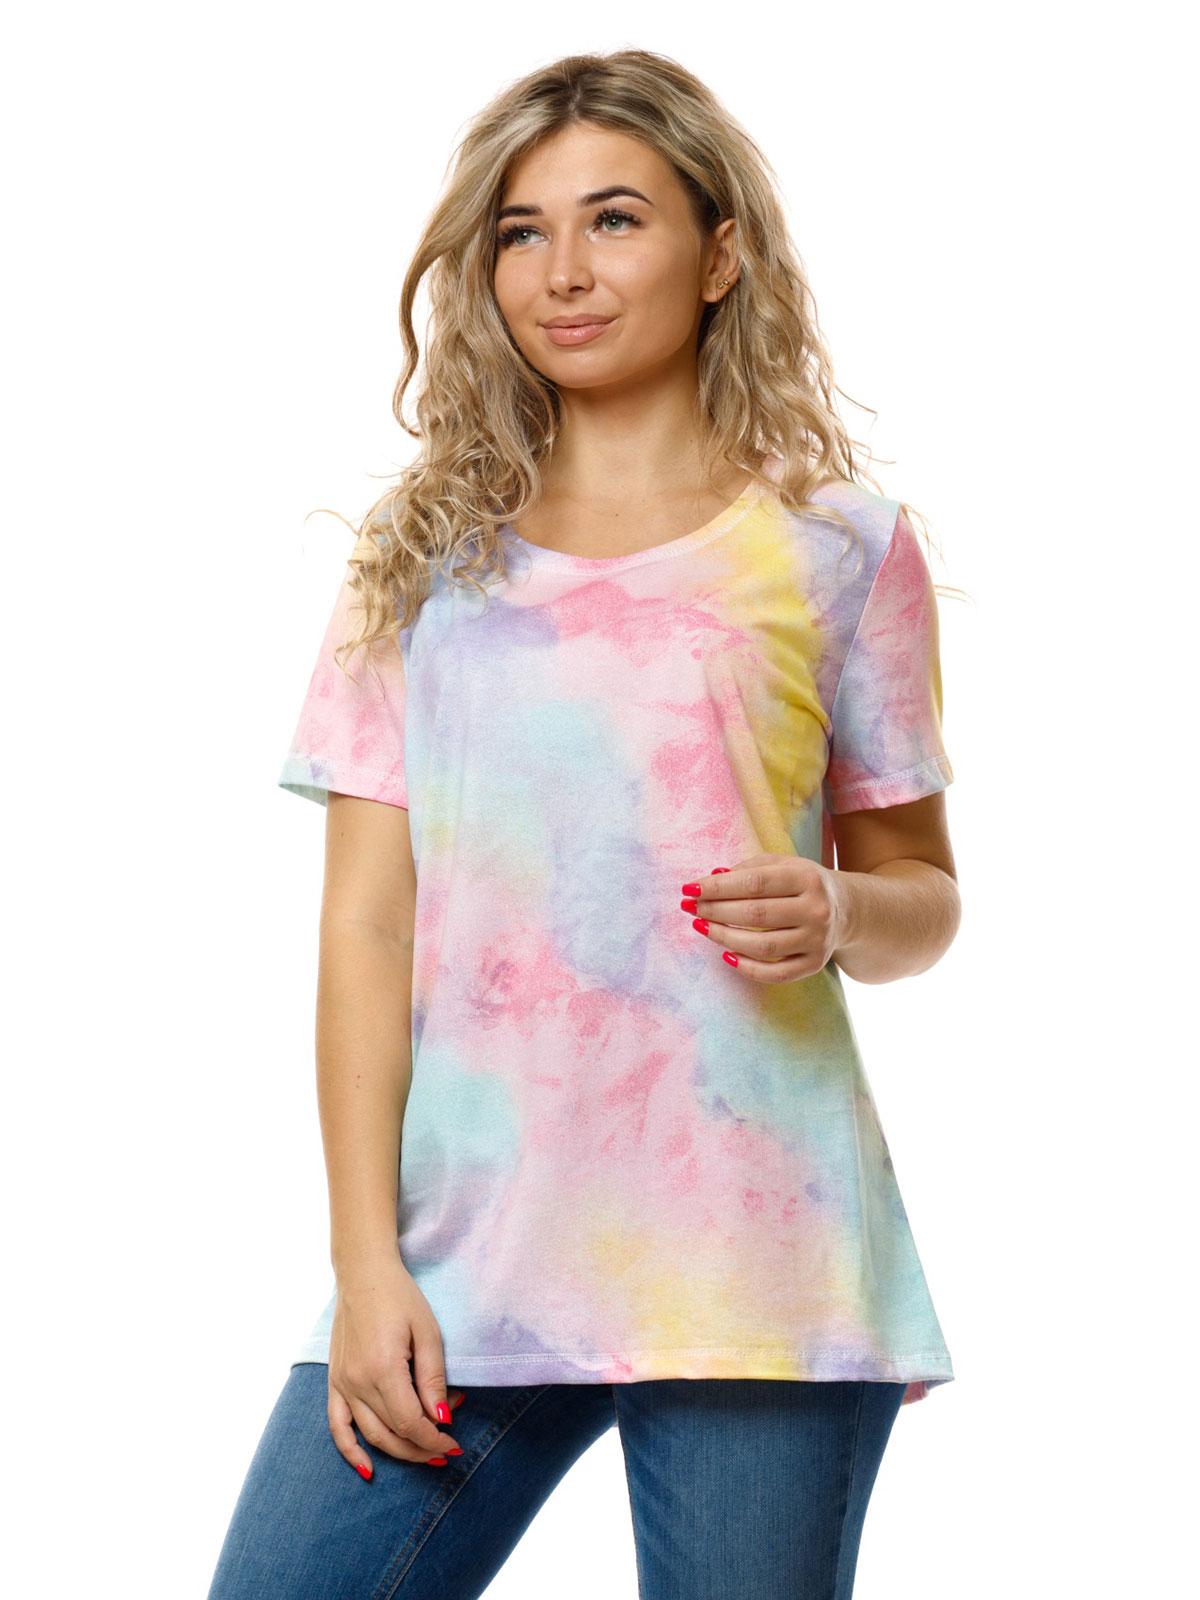 Жен. футболка арт. 16-0853 Бирюзовый р. 50